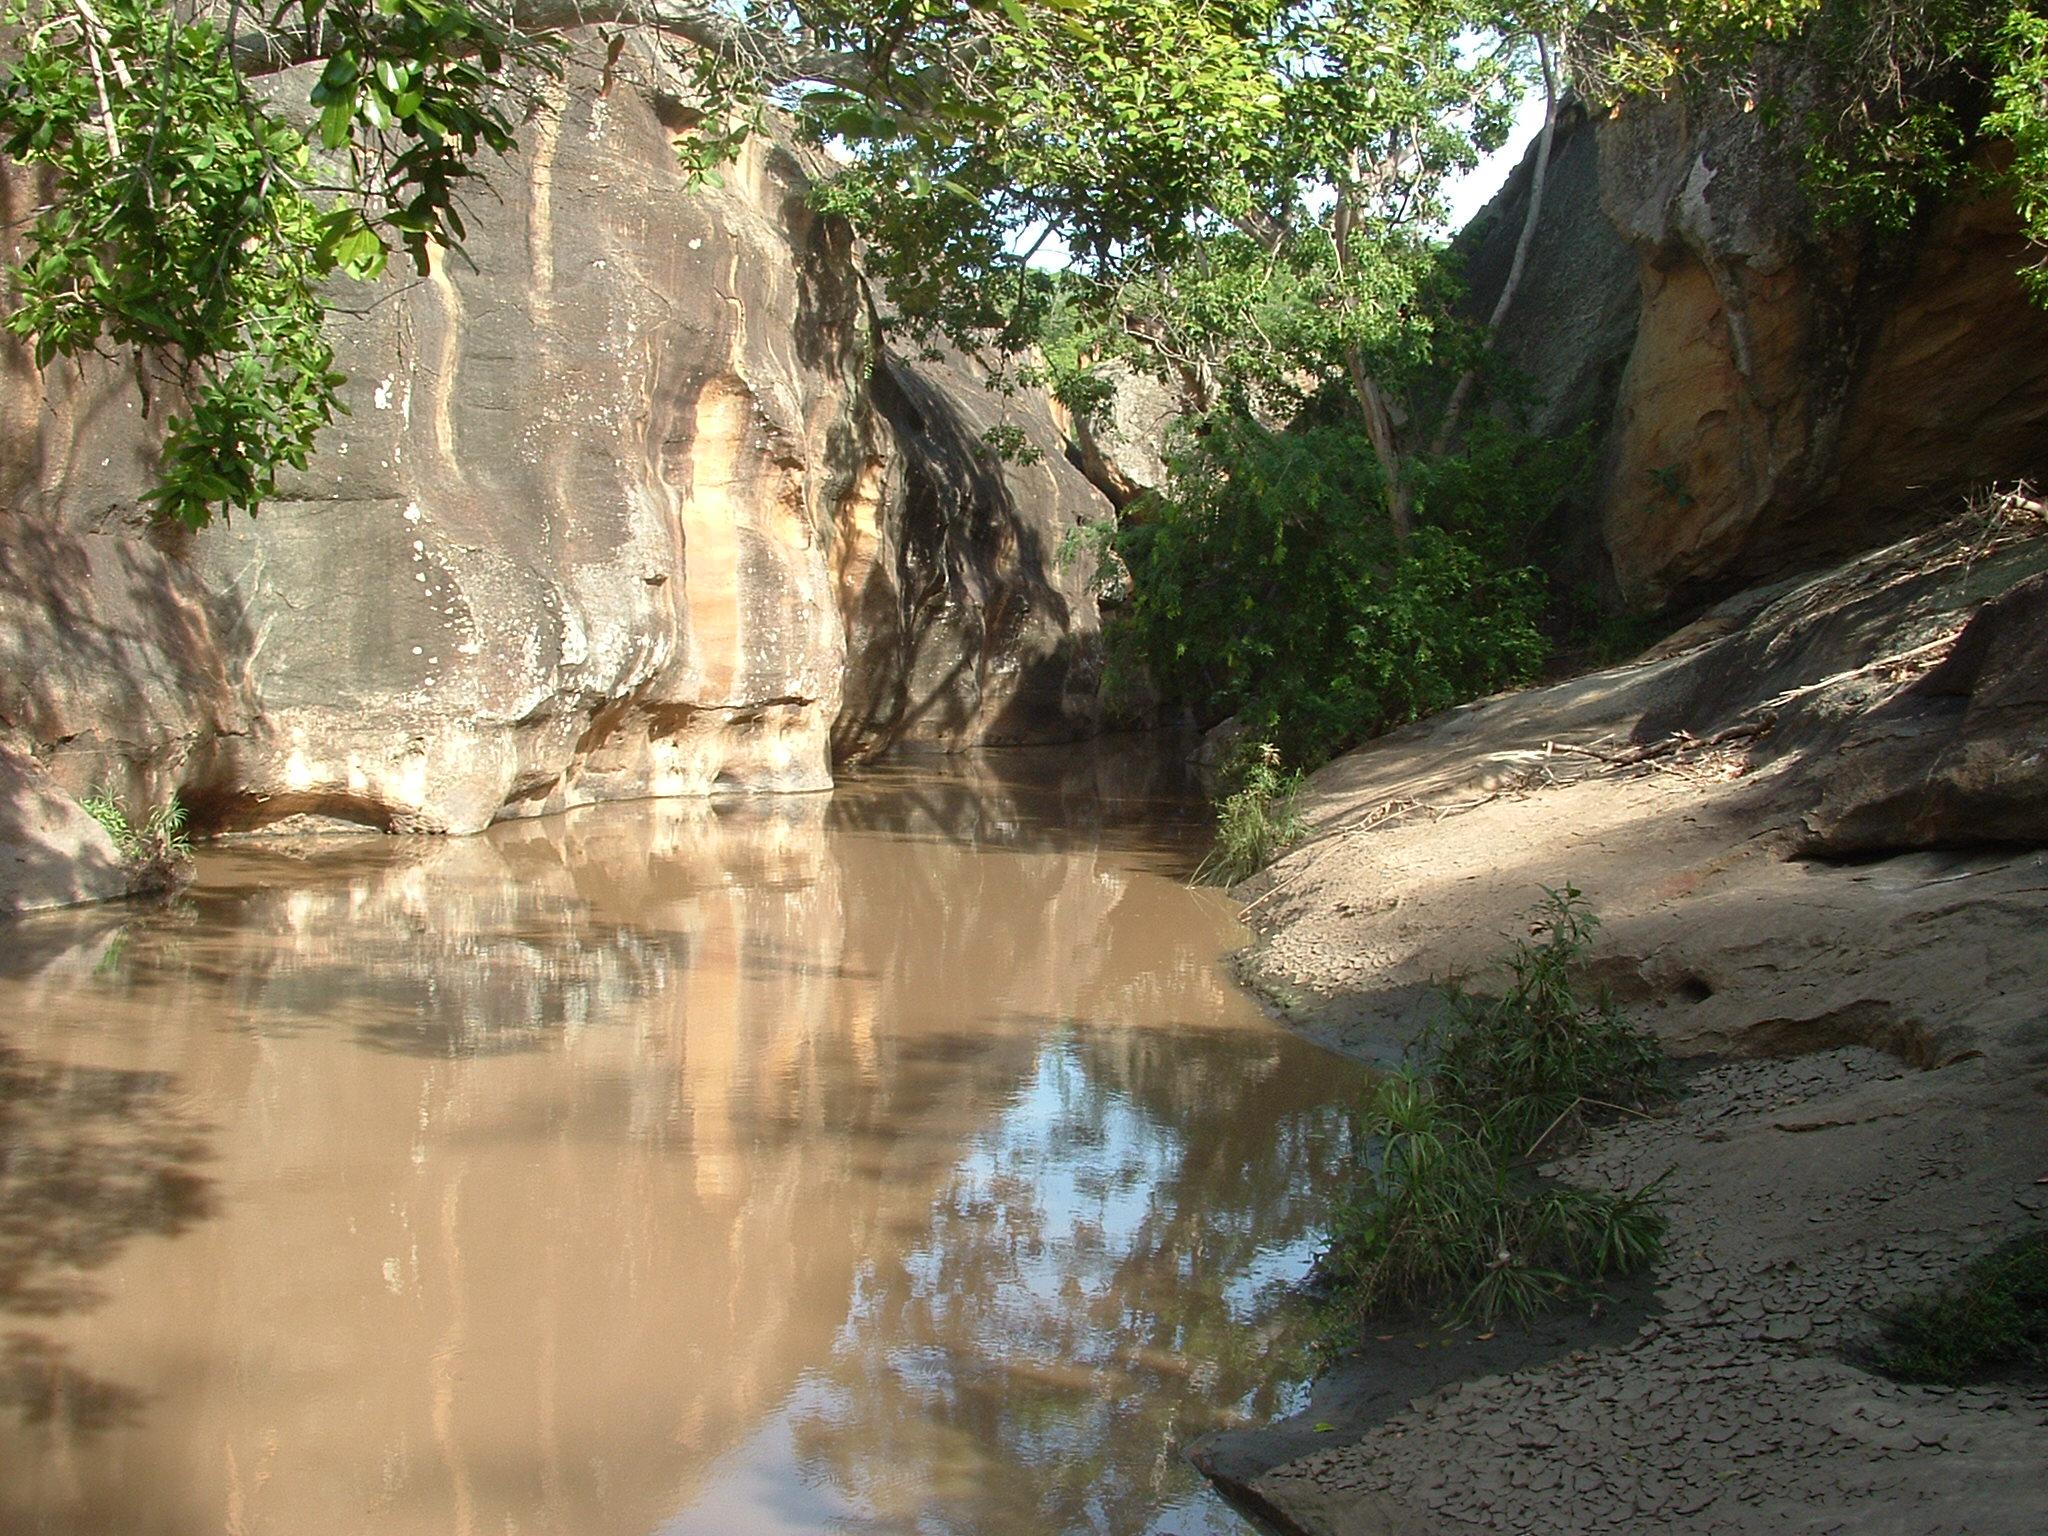 Mwabvi Gorge in Mwabvi Wildlife Reserve Malawi